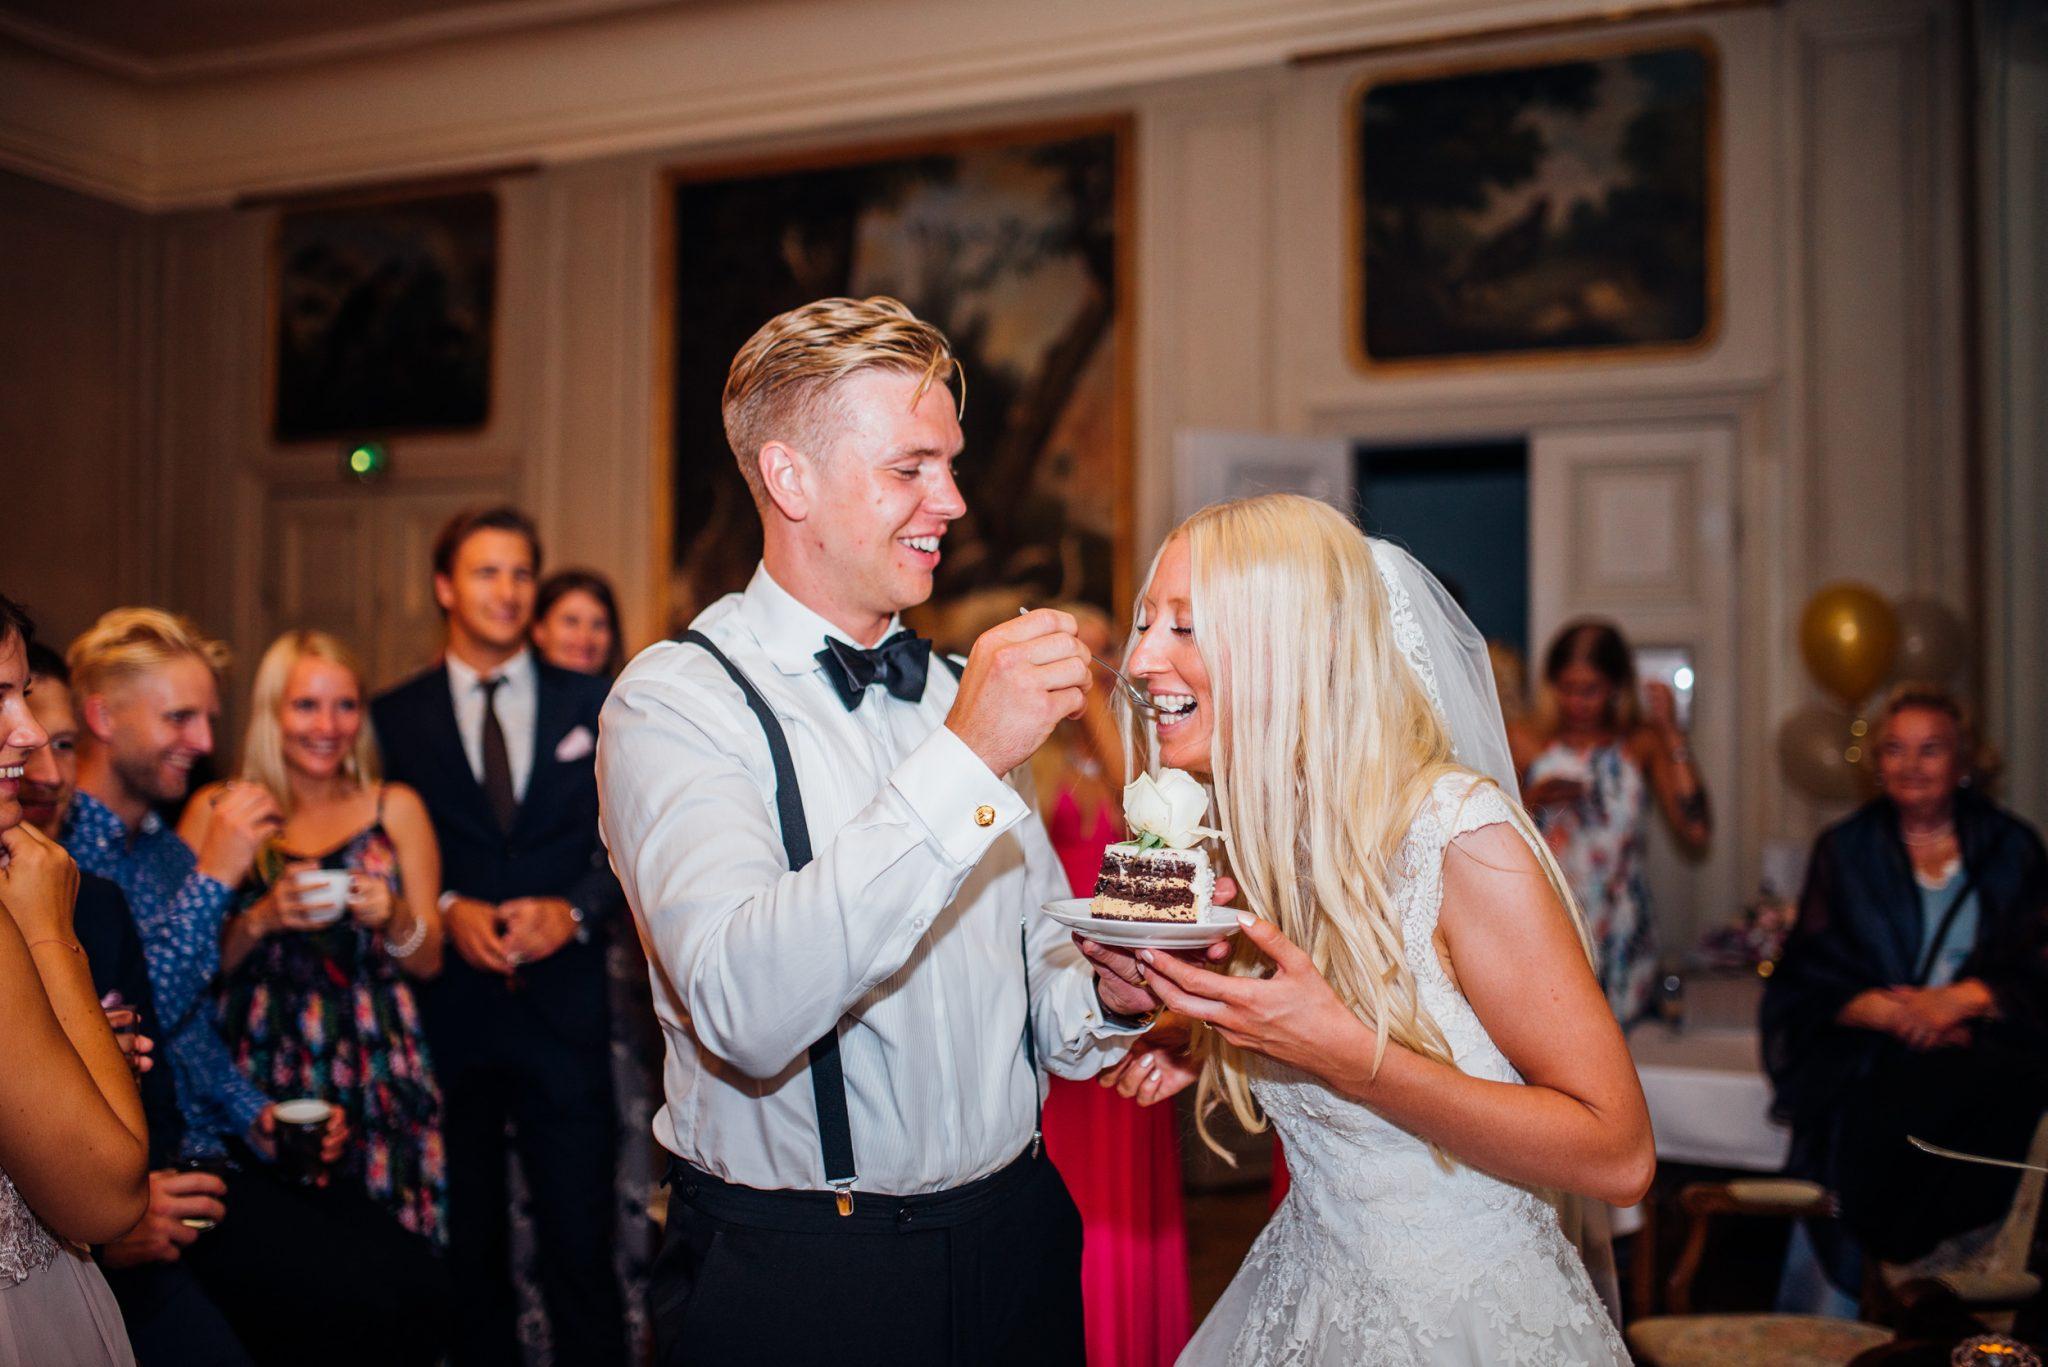 Sonny Emelie Åkeshofs Slott Bromma Stockholm Bröllopsfotograf Martina Lundborg Fotograf Bröllop